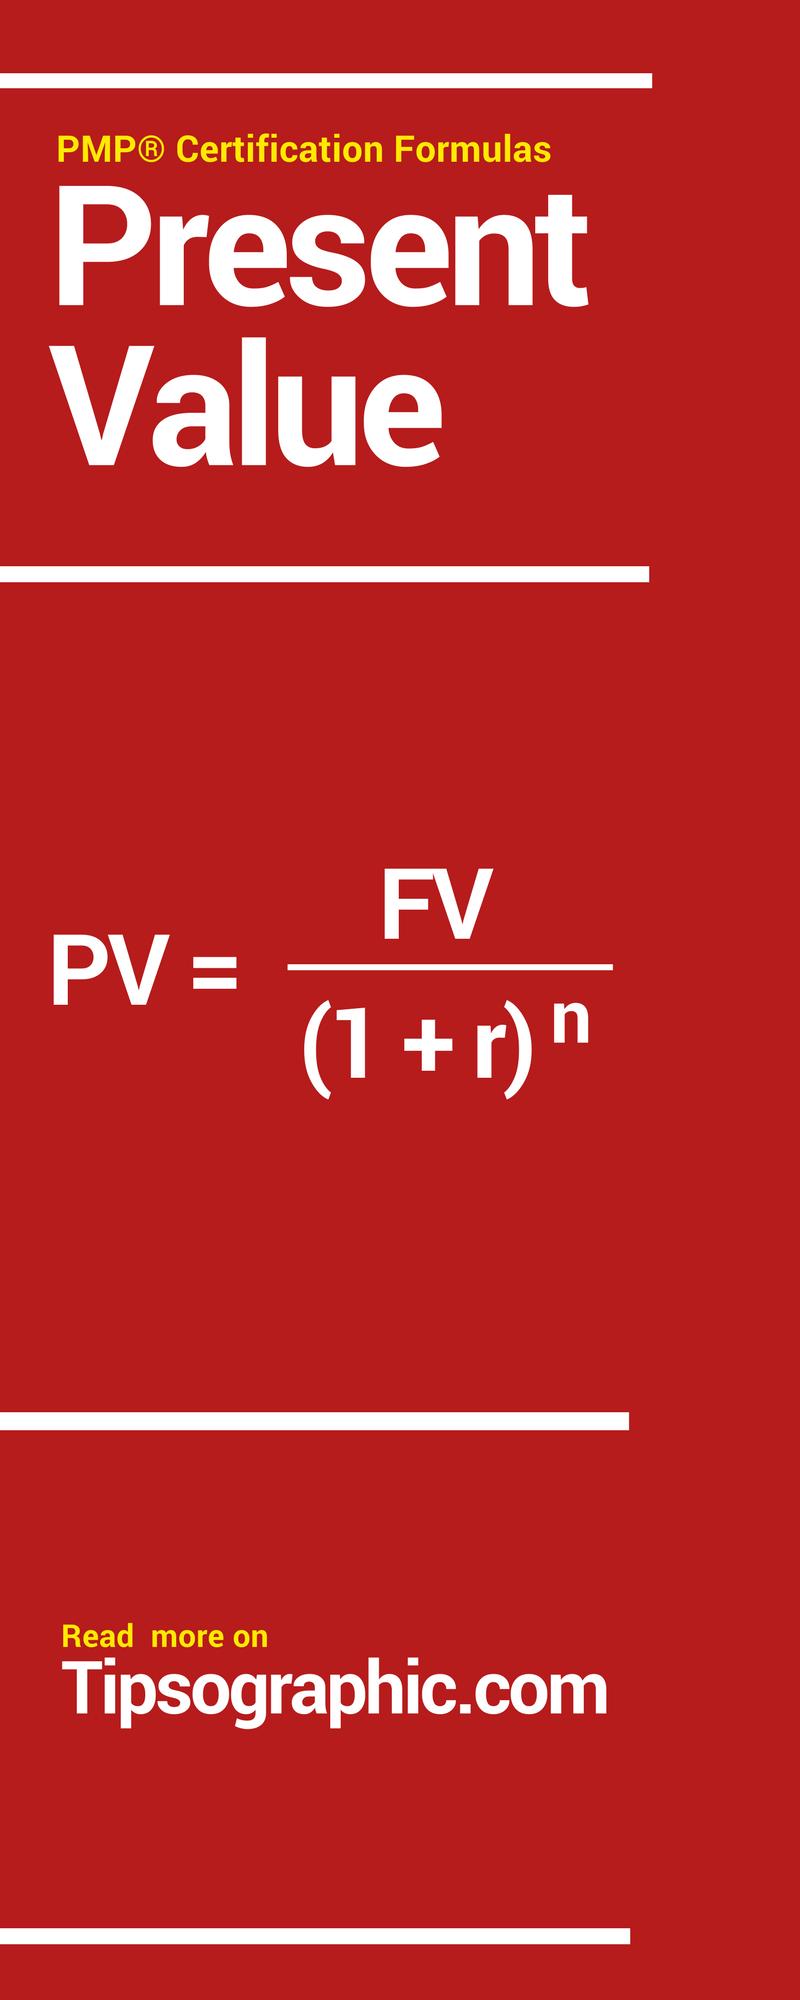 Pmp Certification Formulas Present Value Pinterest Pmp Exam